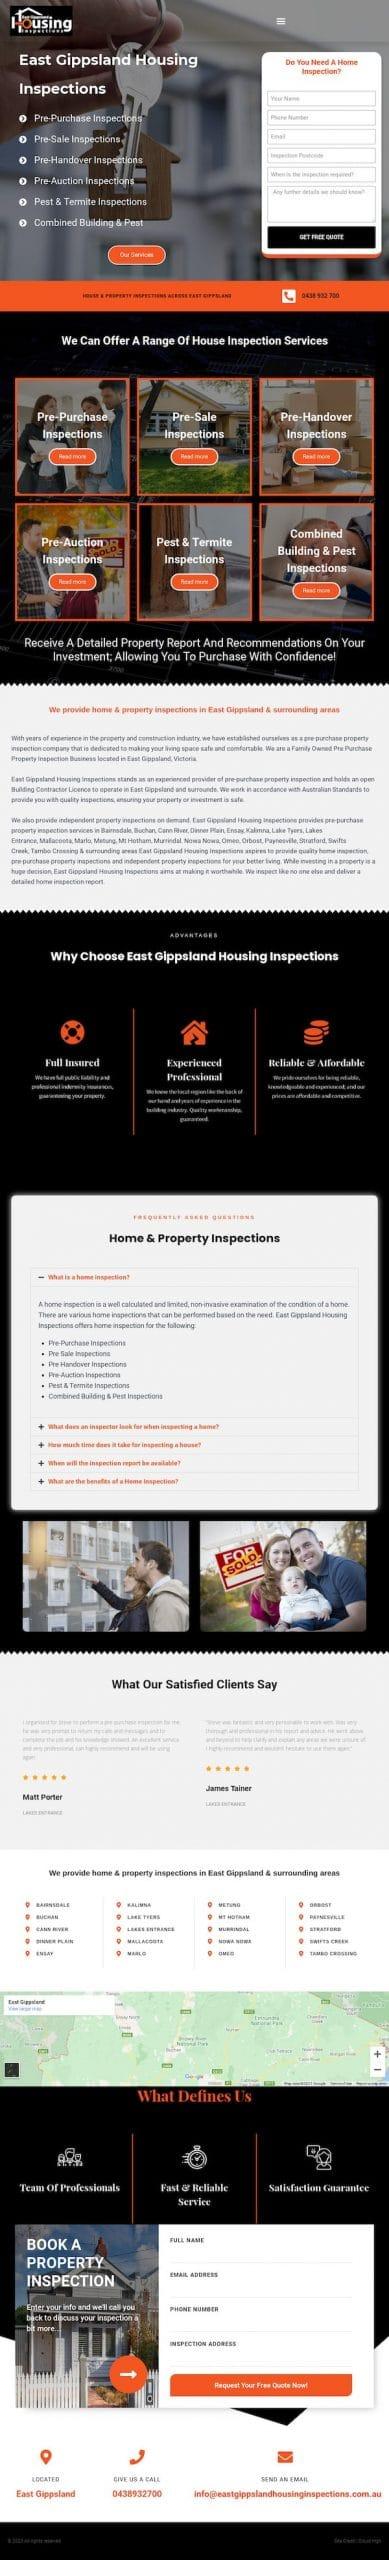 East Gippsland Housing Inspections - WordPress Website Designer Sydney - Cloud High